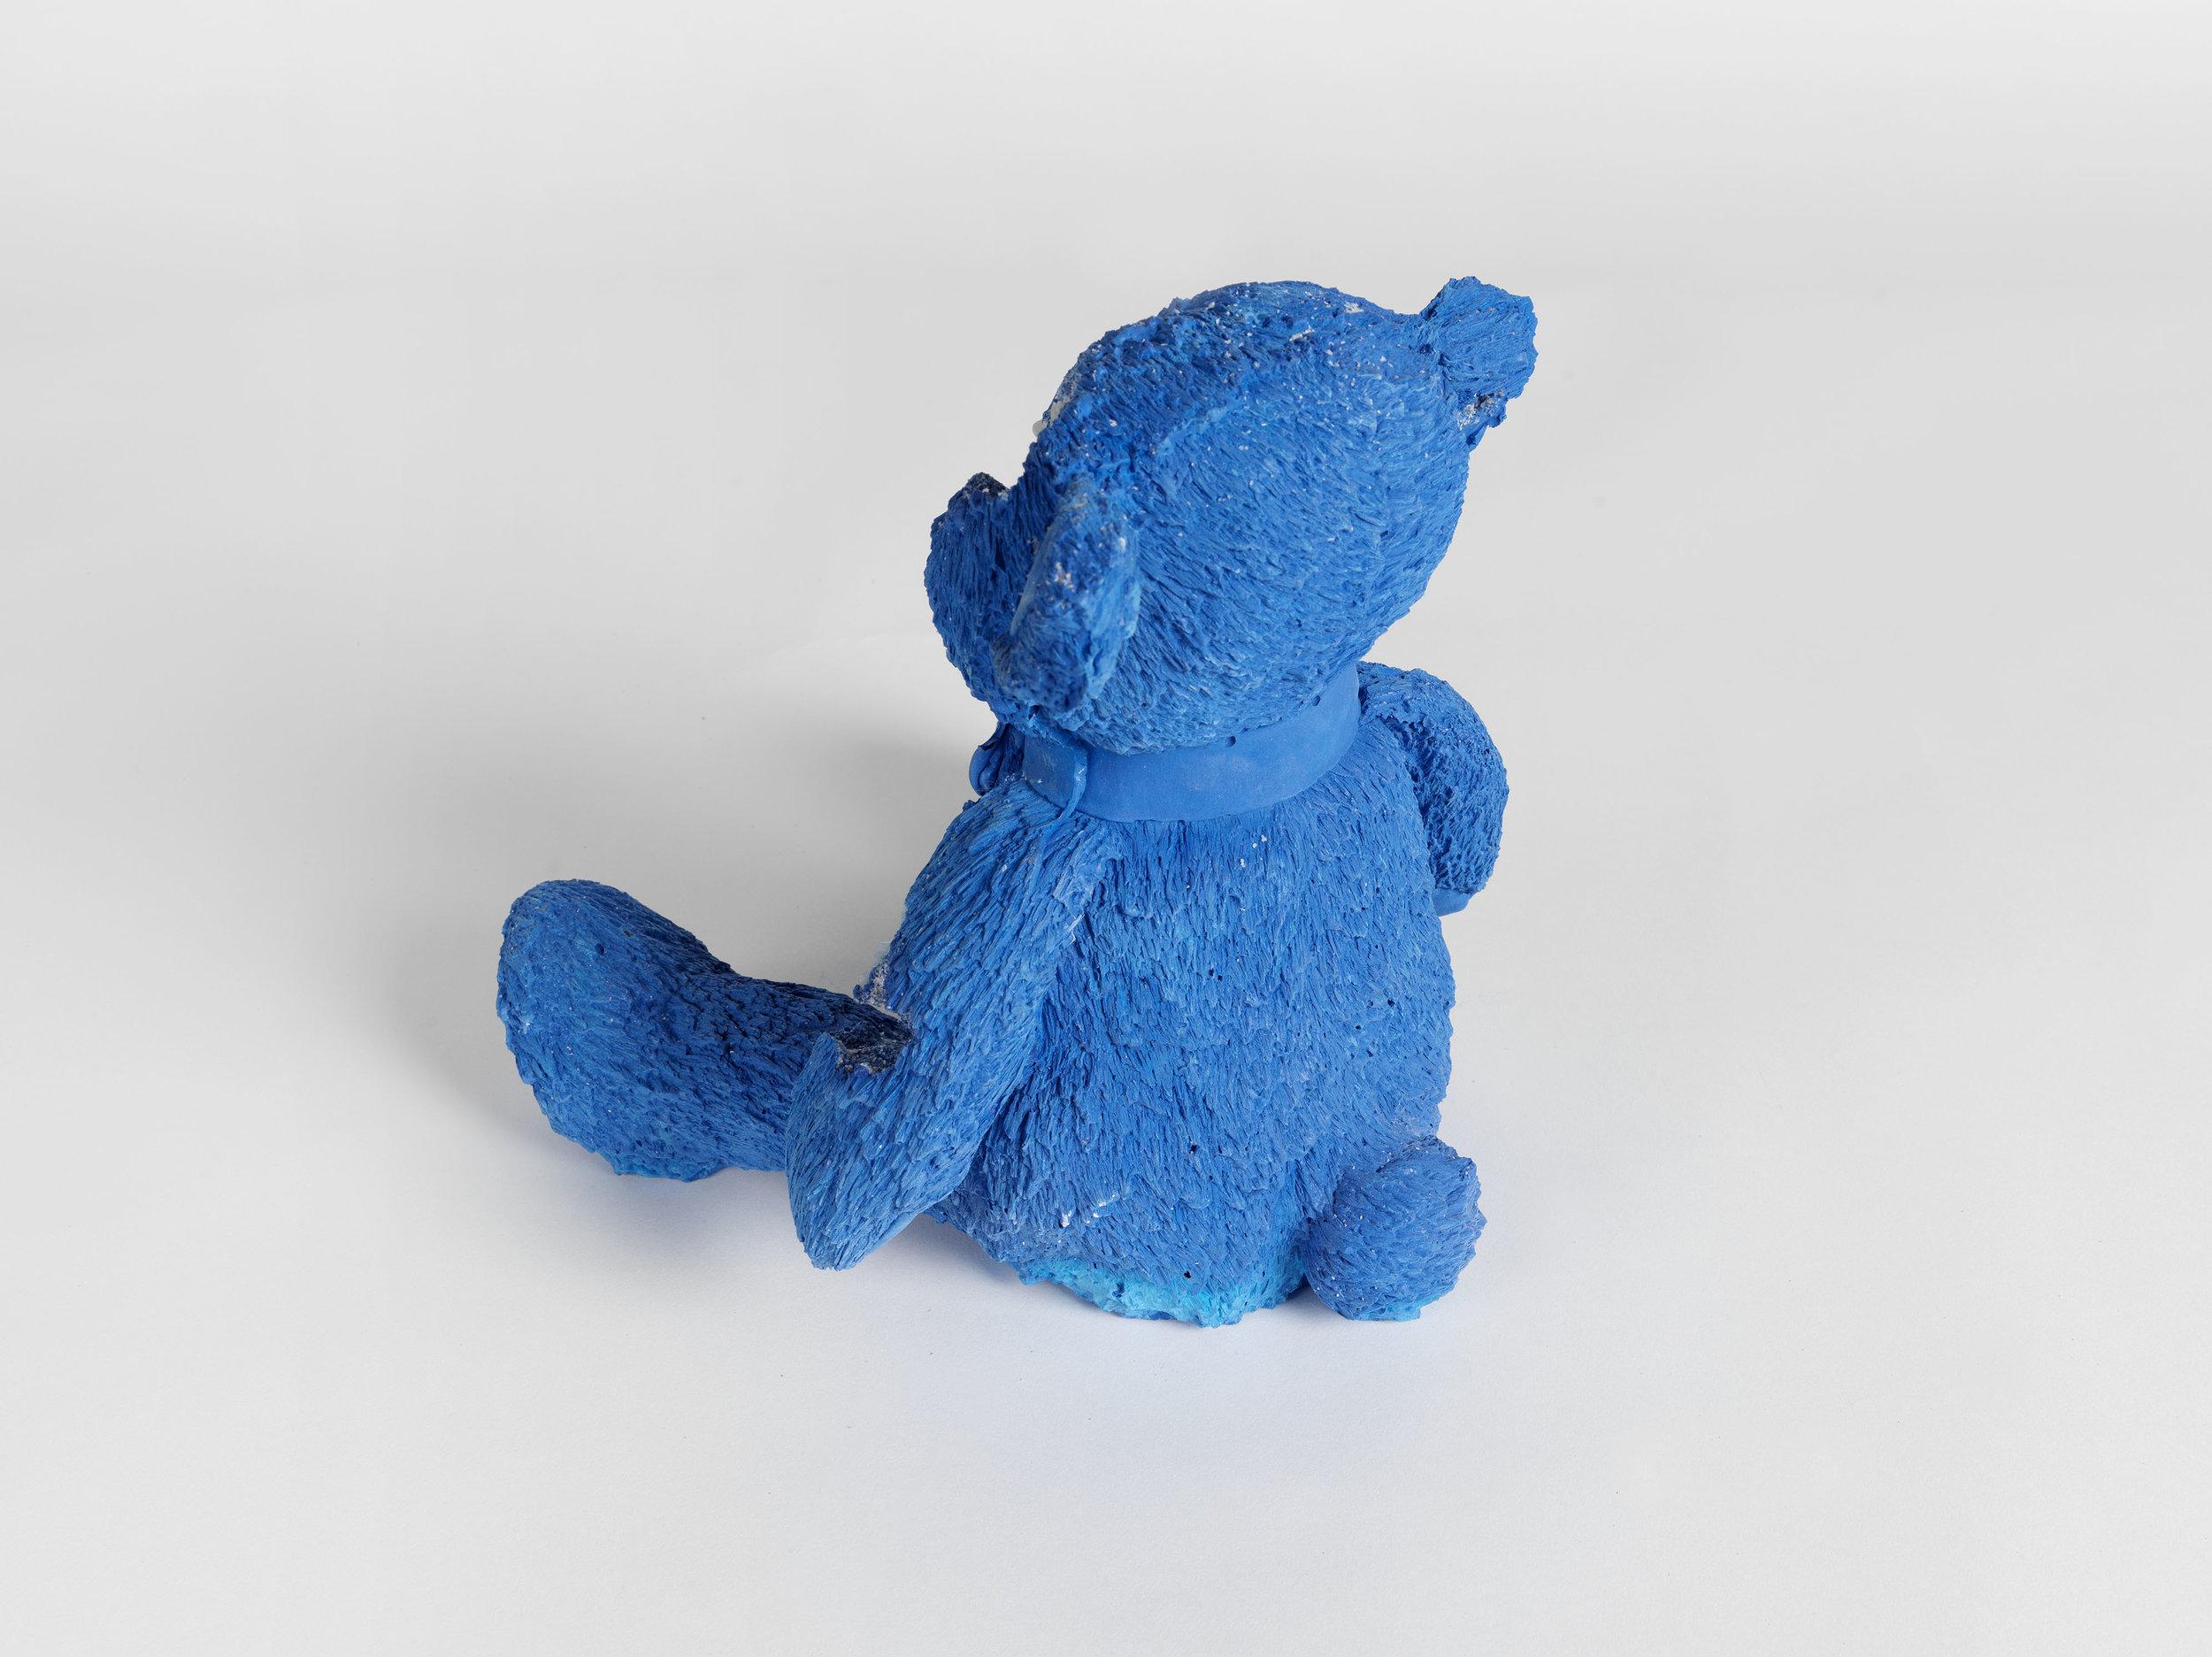 Teddy bear small blue calcite daniel arsham teddy bear smallblue calcitehd4g thecheapjerseys Choice Image